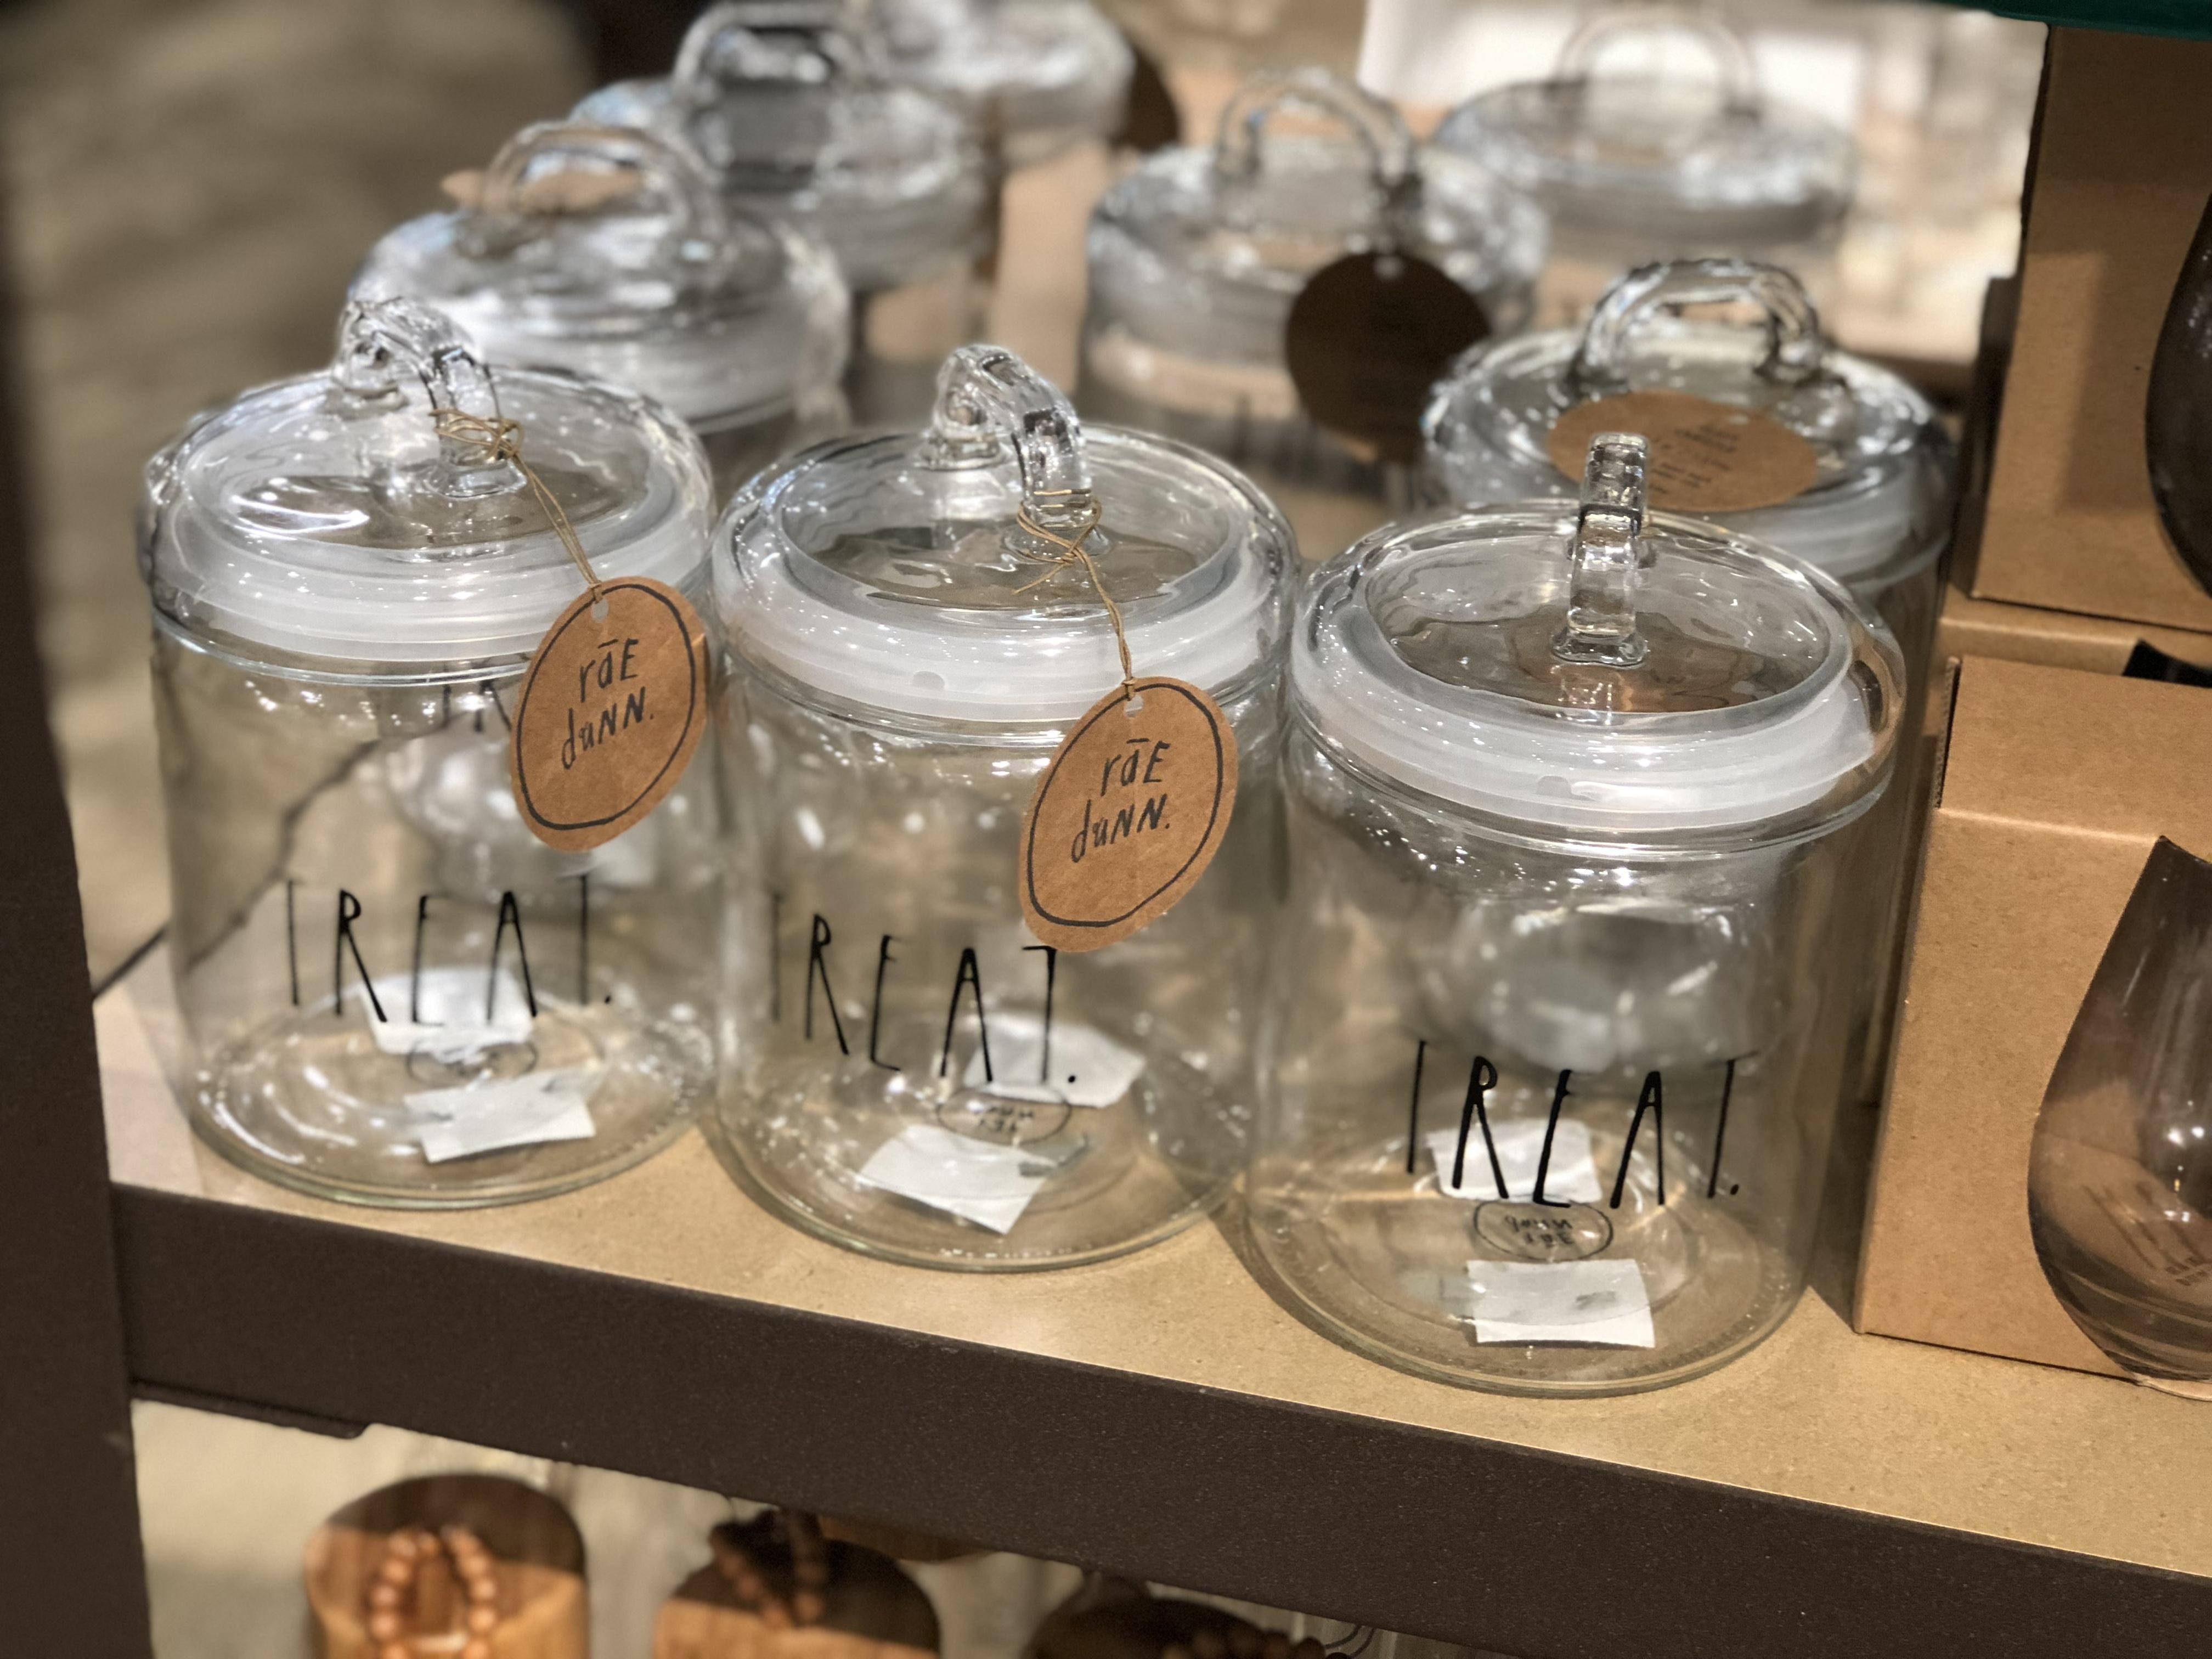 Rae Dunn collection at Kirklands - Rae Dunn treat canister